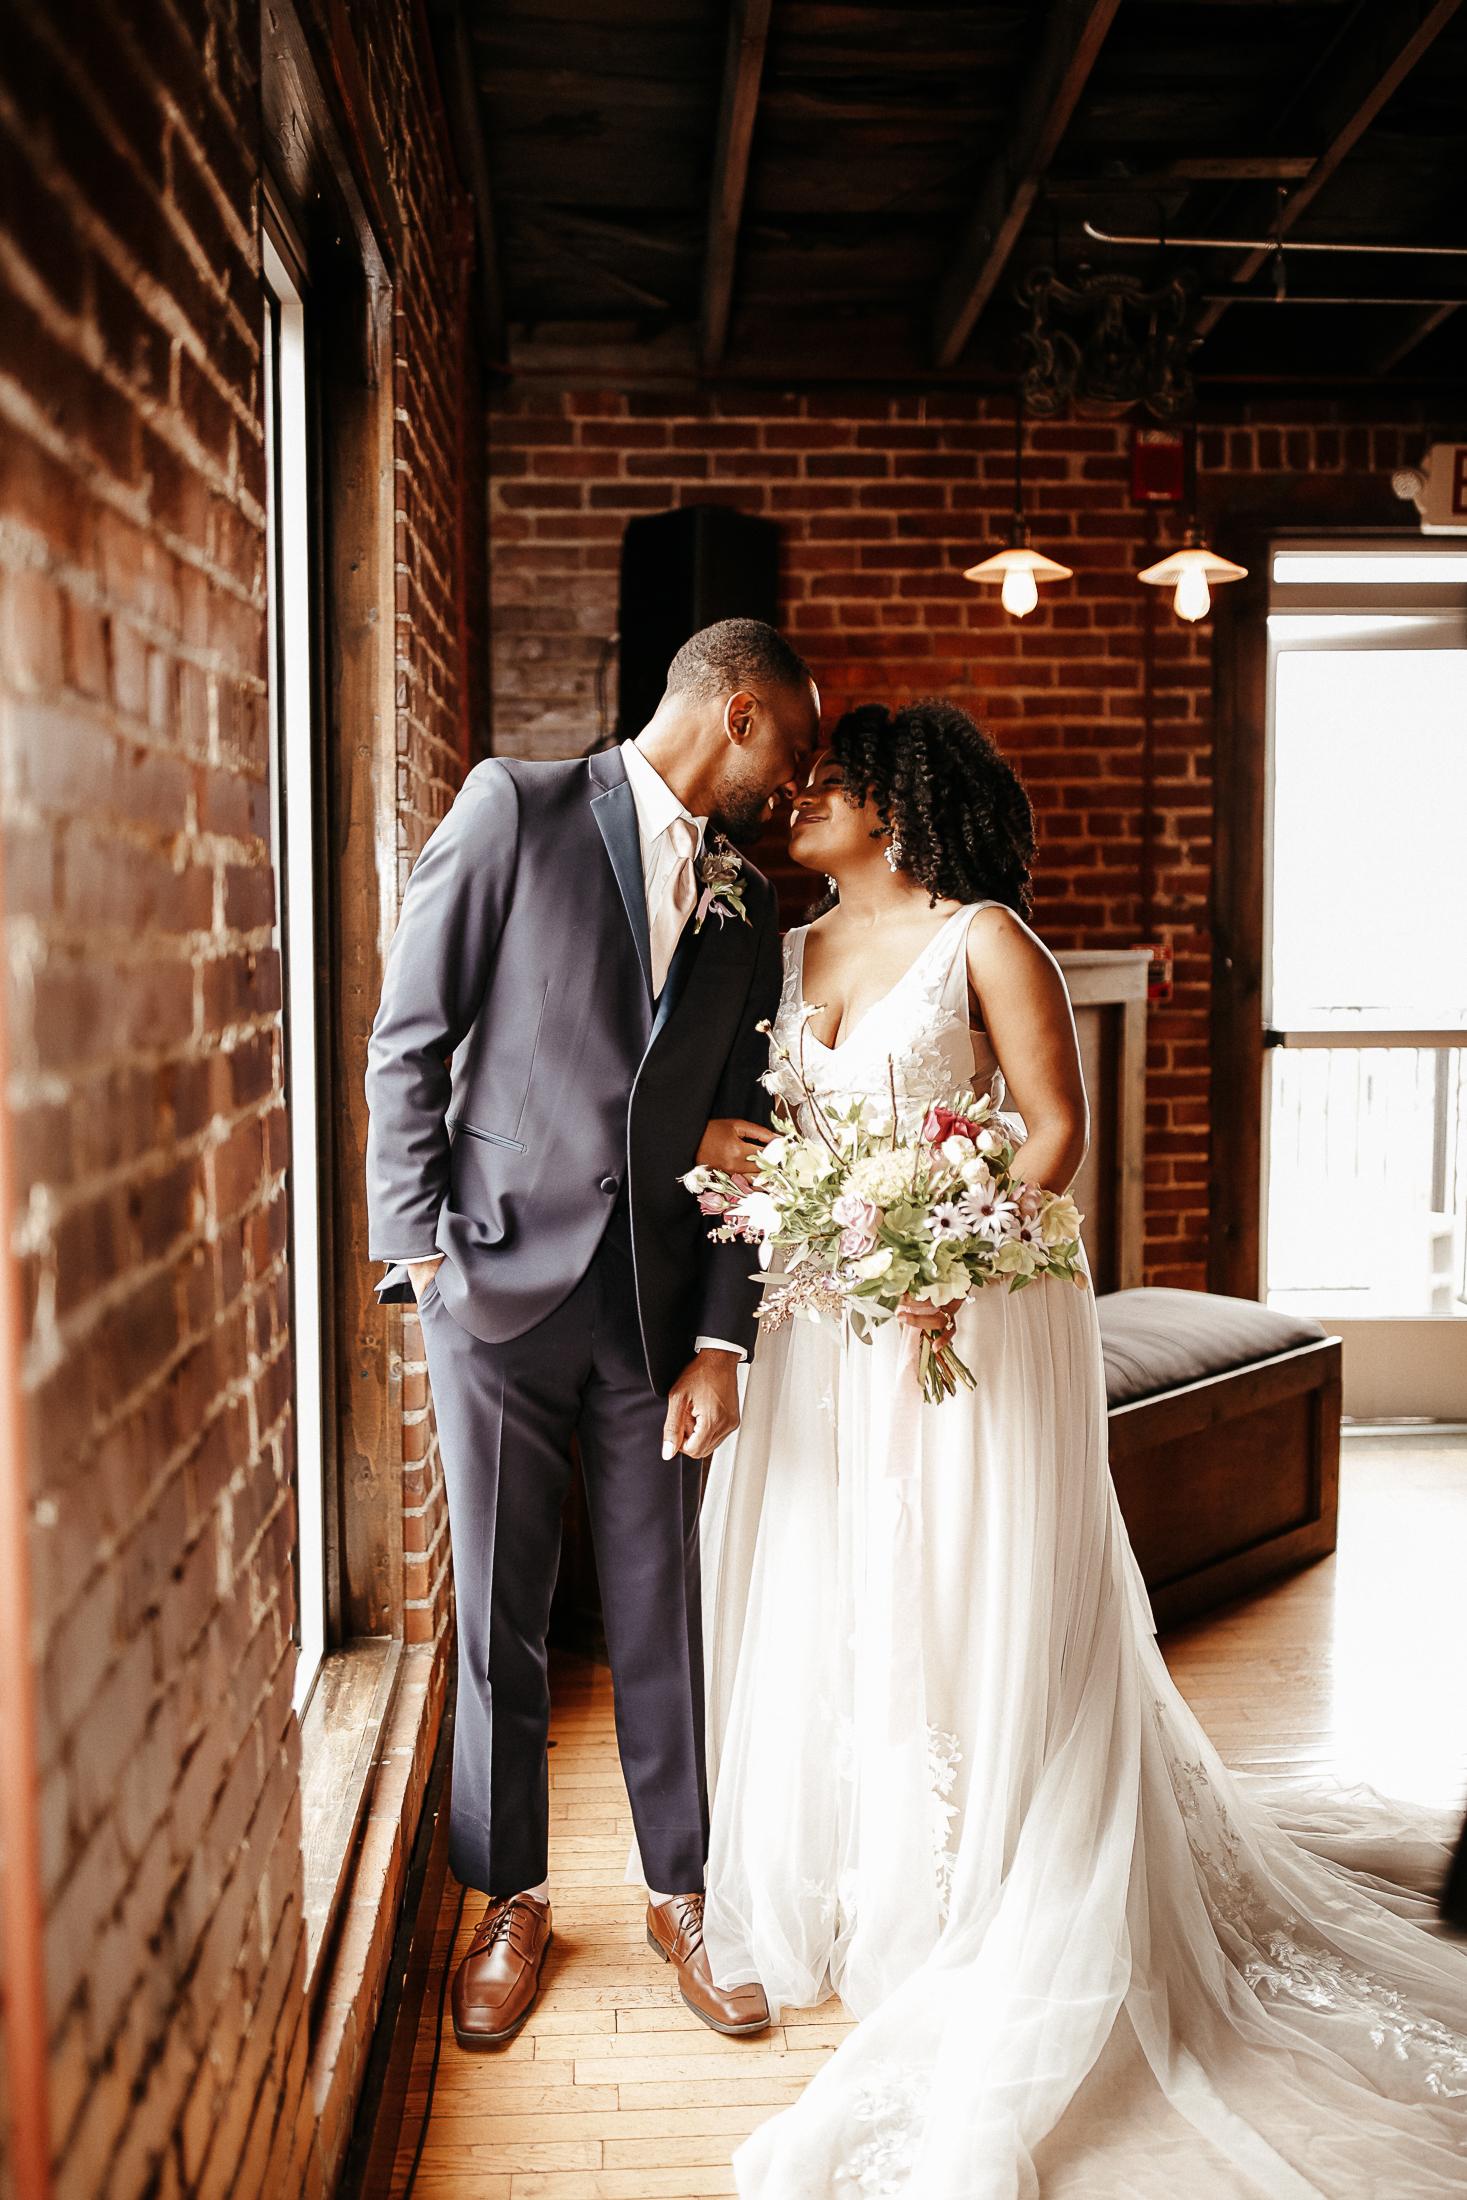 Big Fake Wedding Nashville | Ashlea Marie Photography and Videography